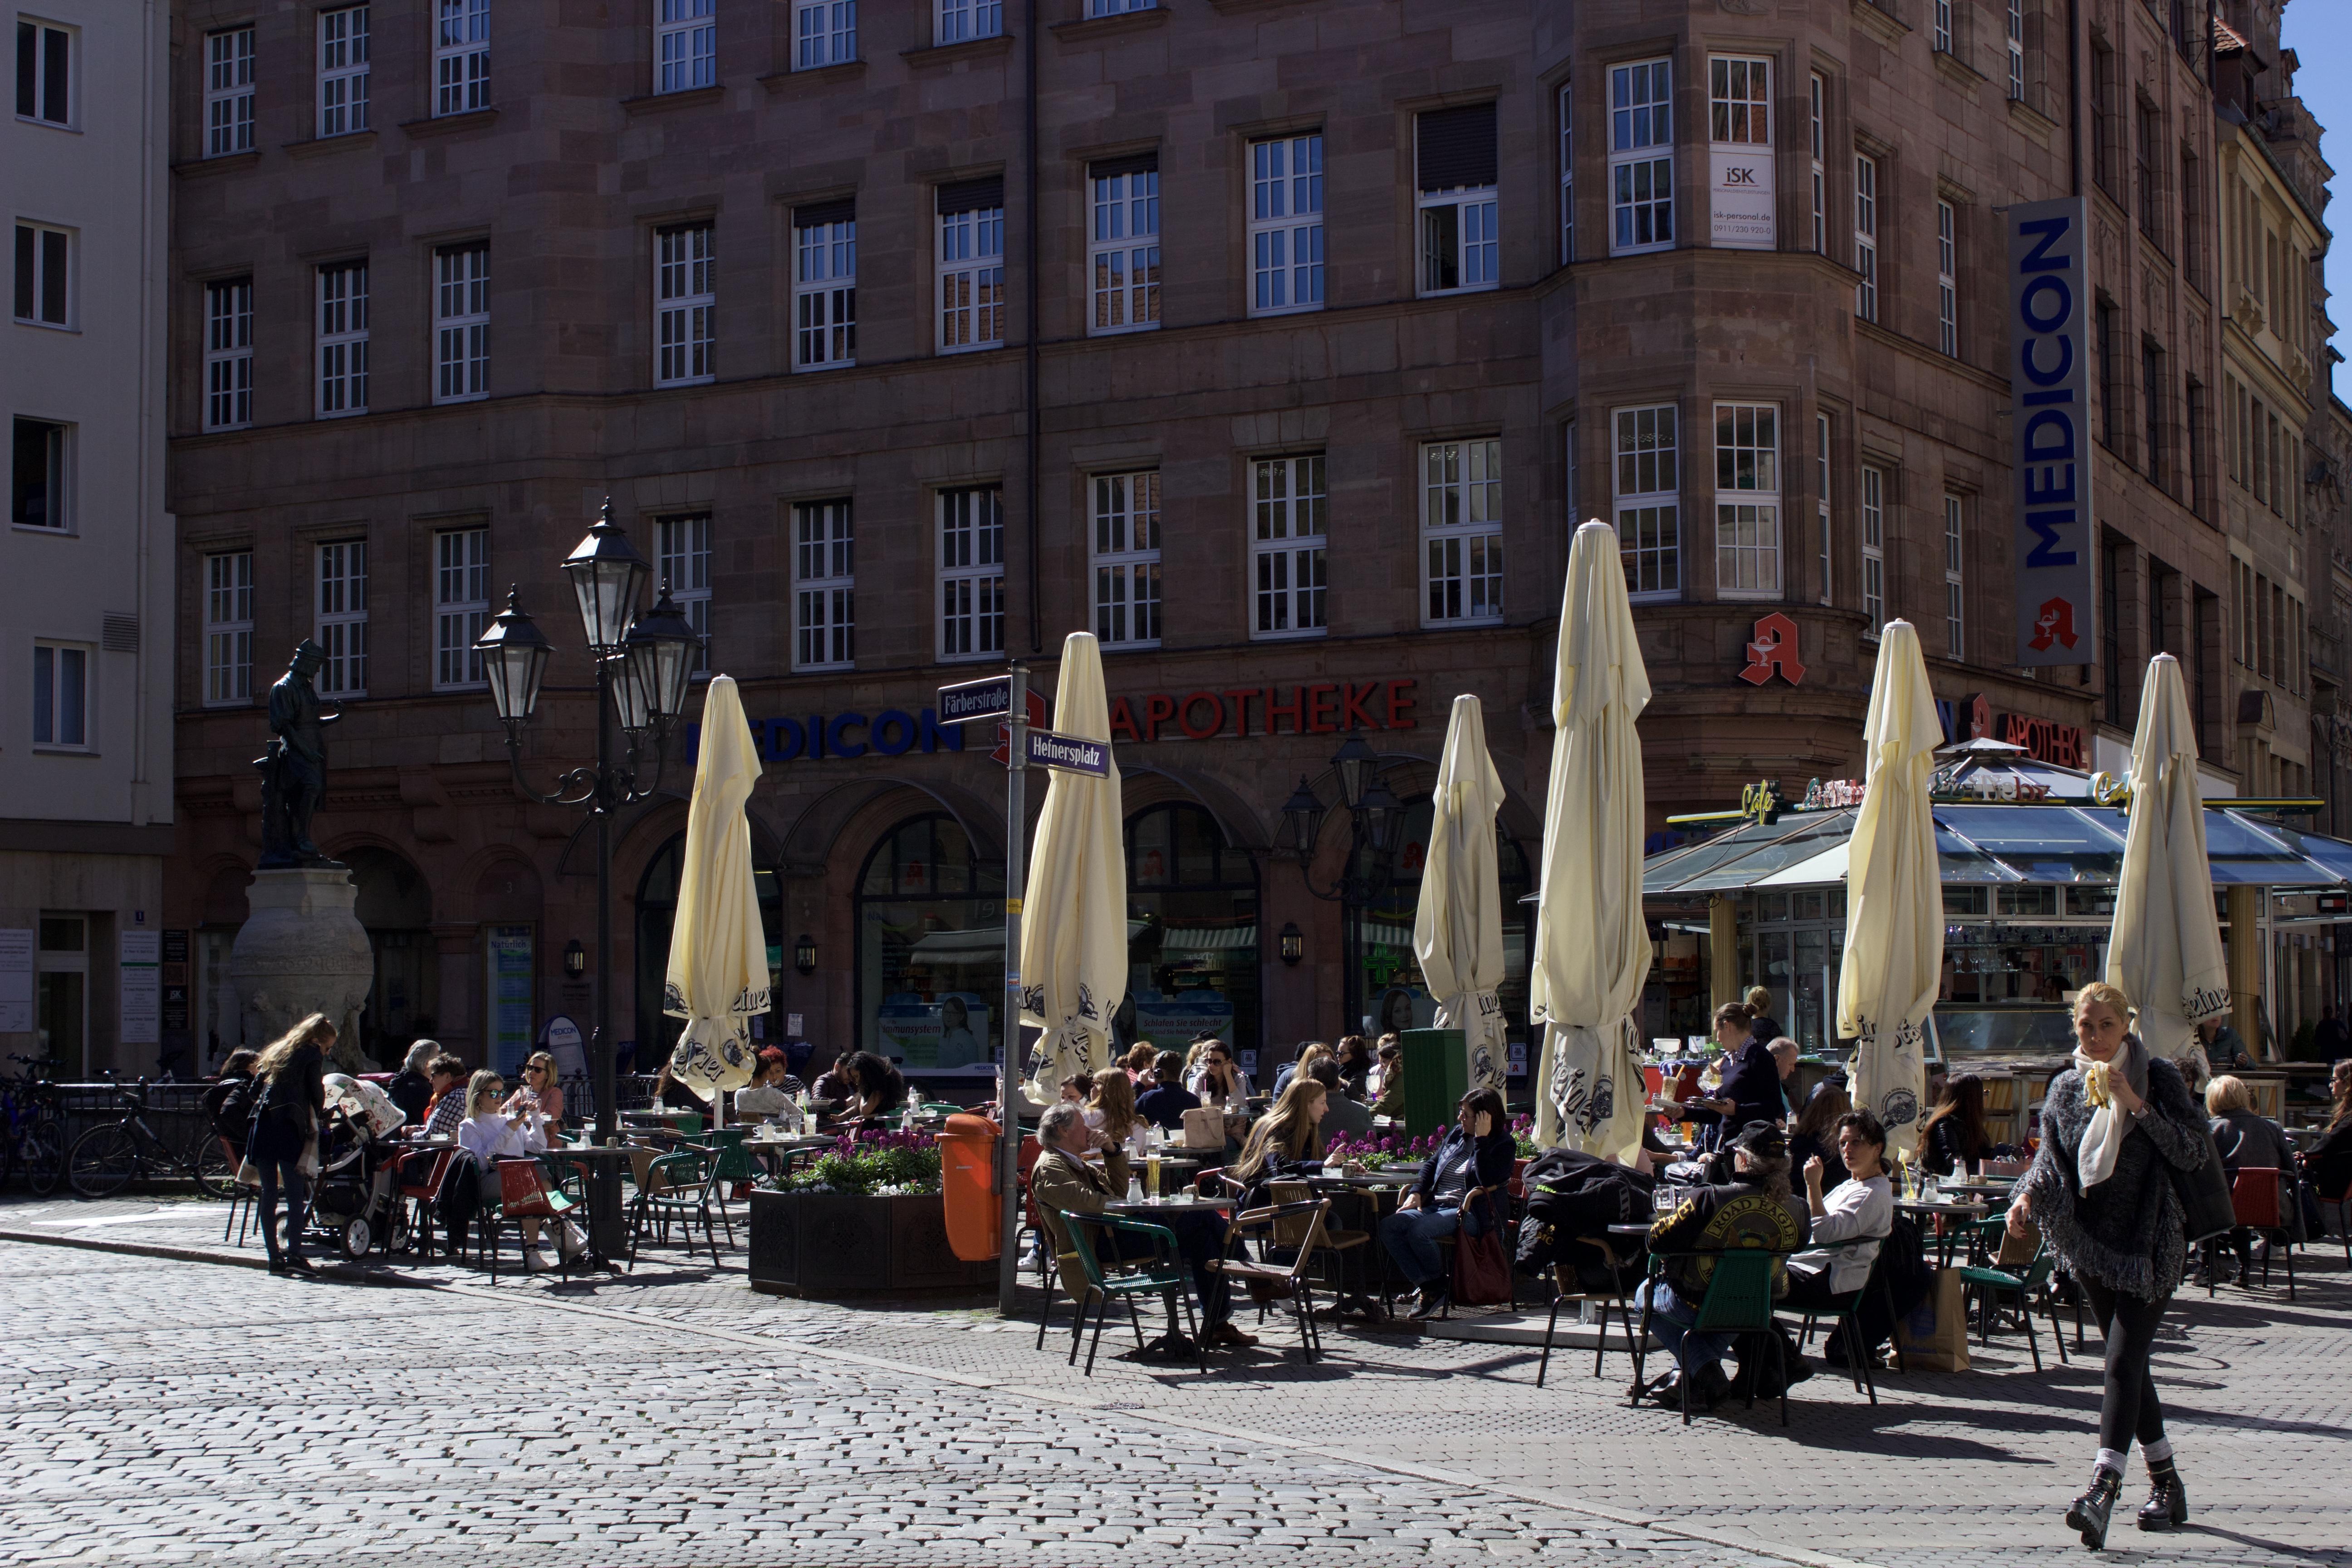 Nuremberg cafe, Germany